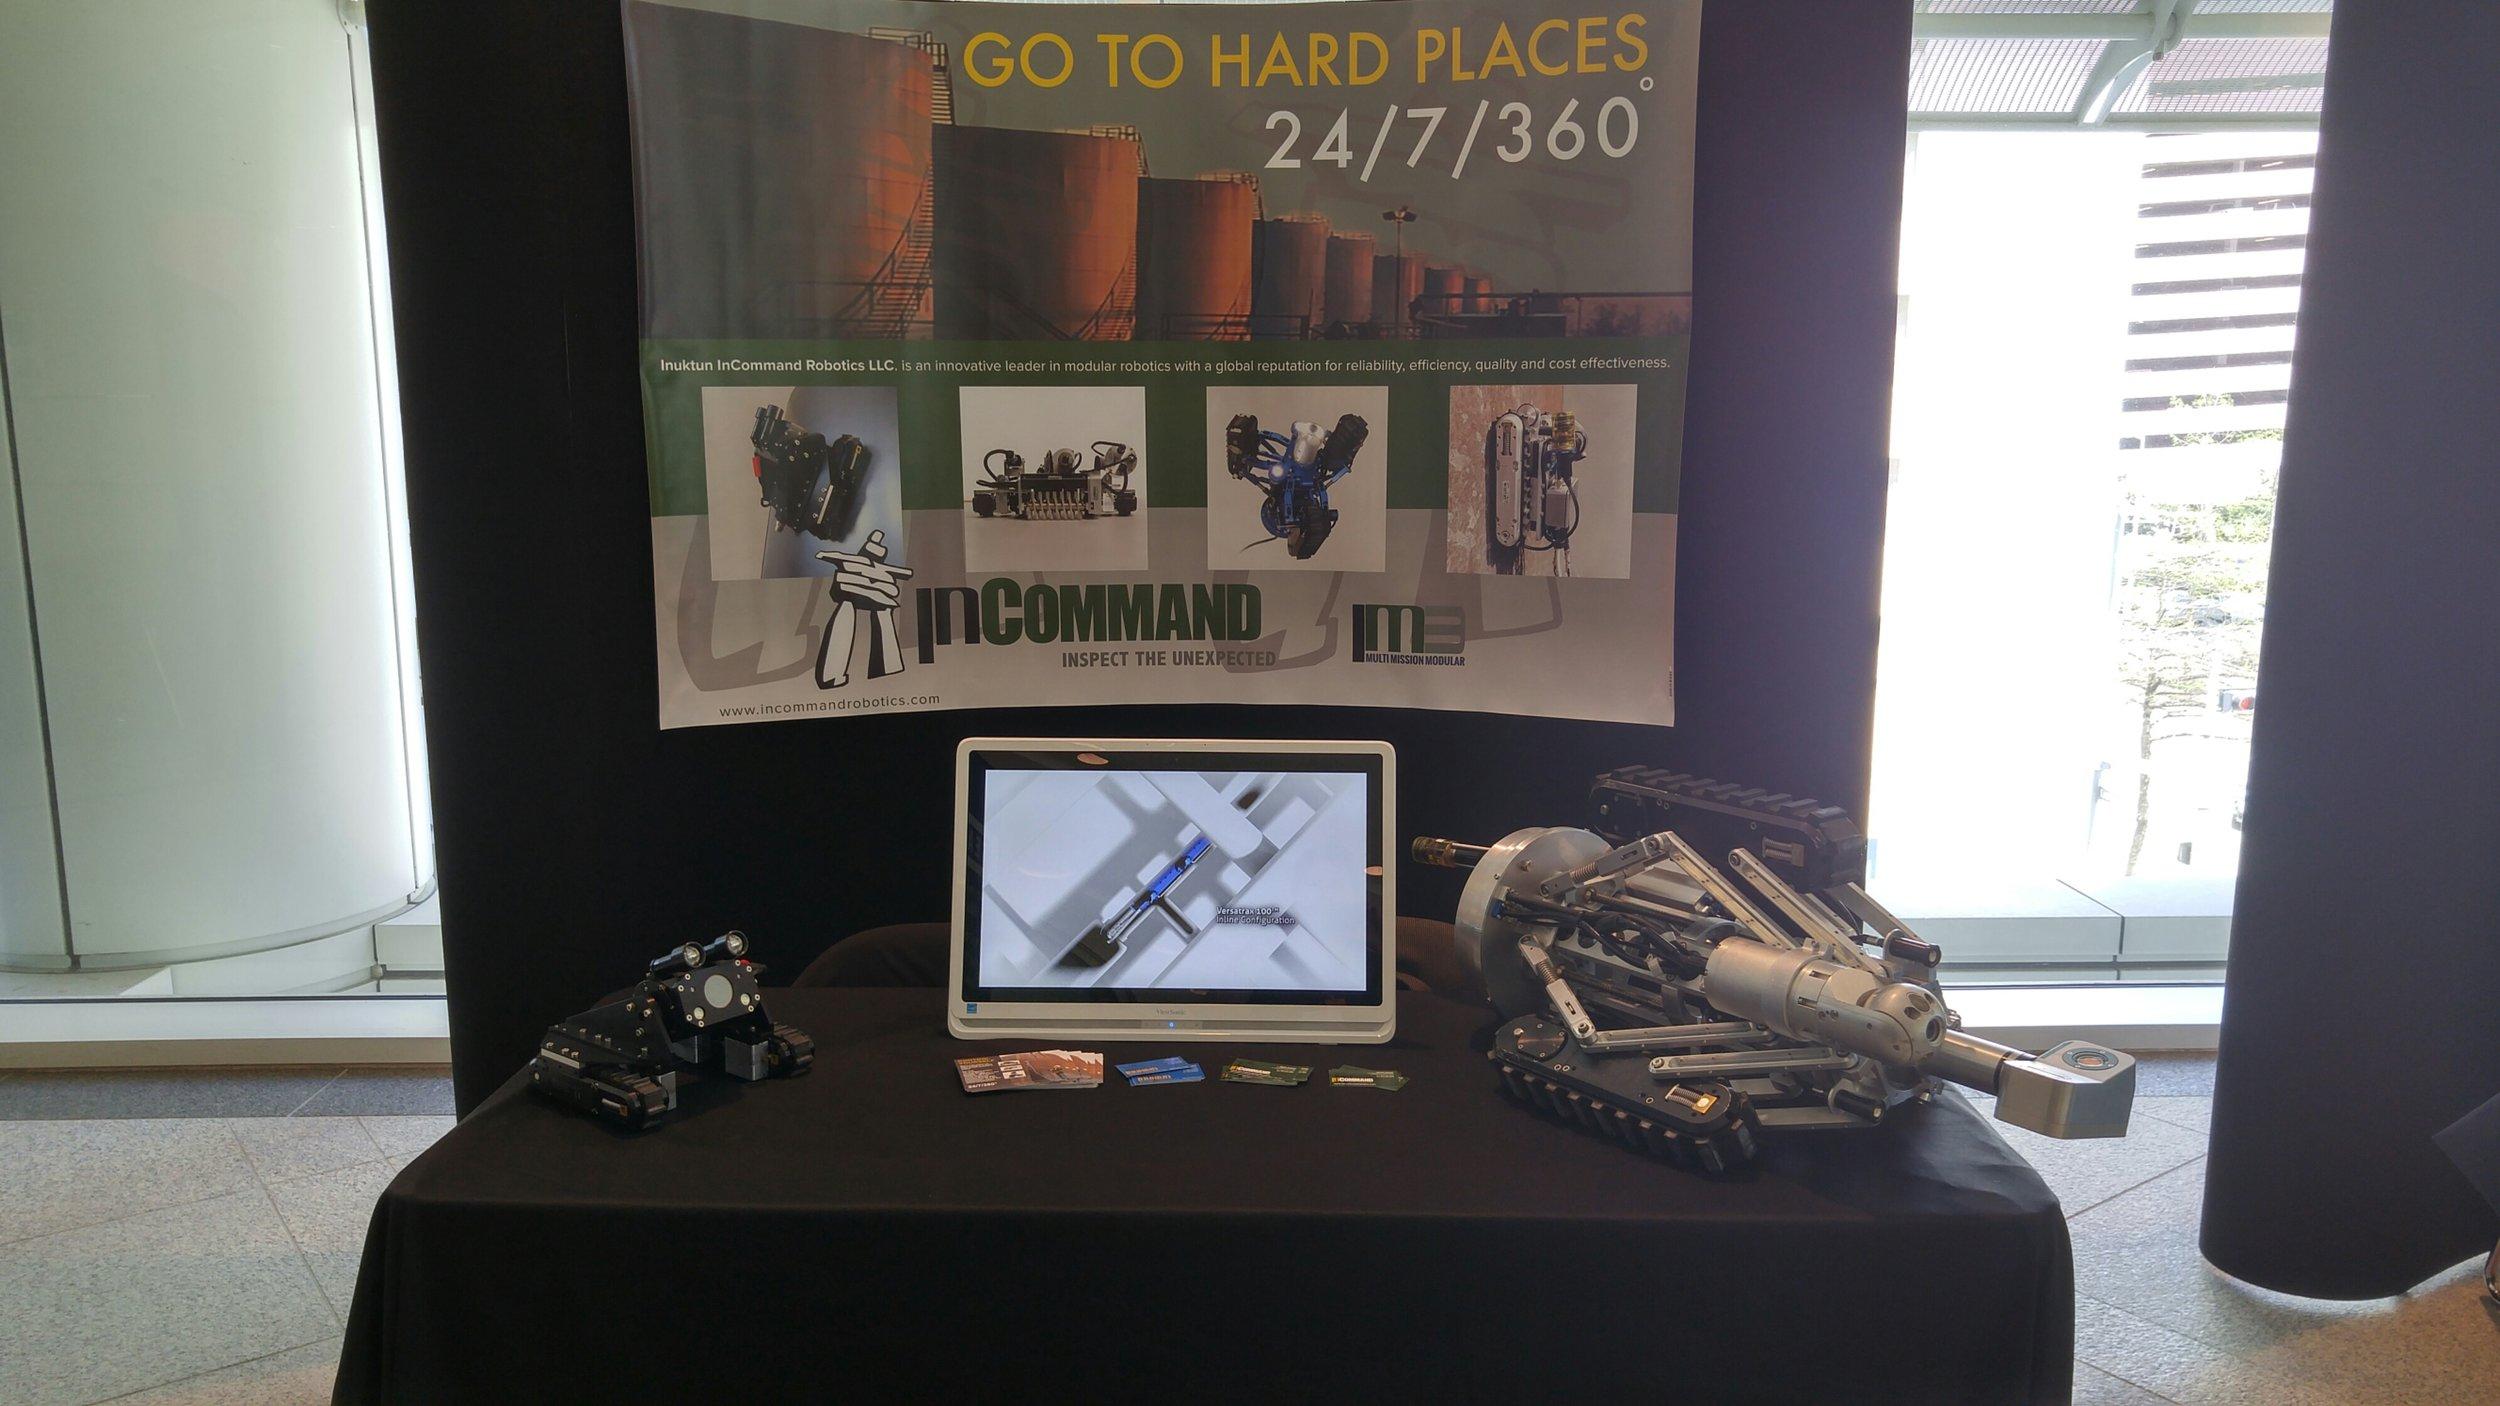 Inuktun InCommand Robotics at the SPRINT Robotics Seminar